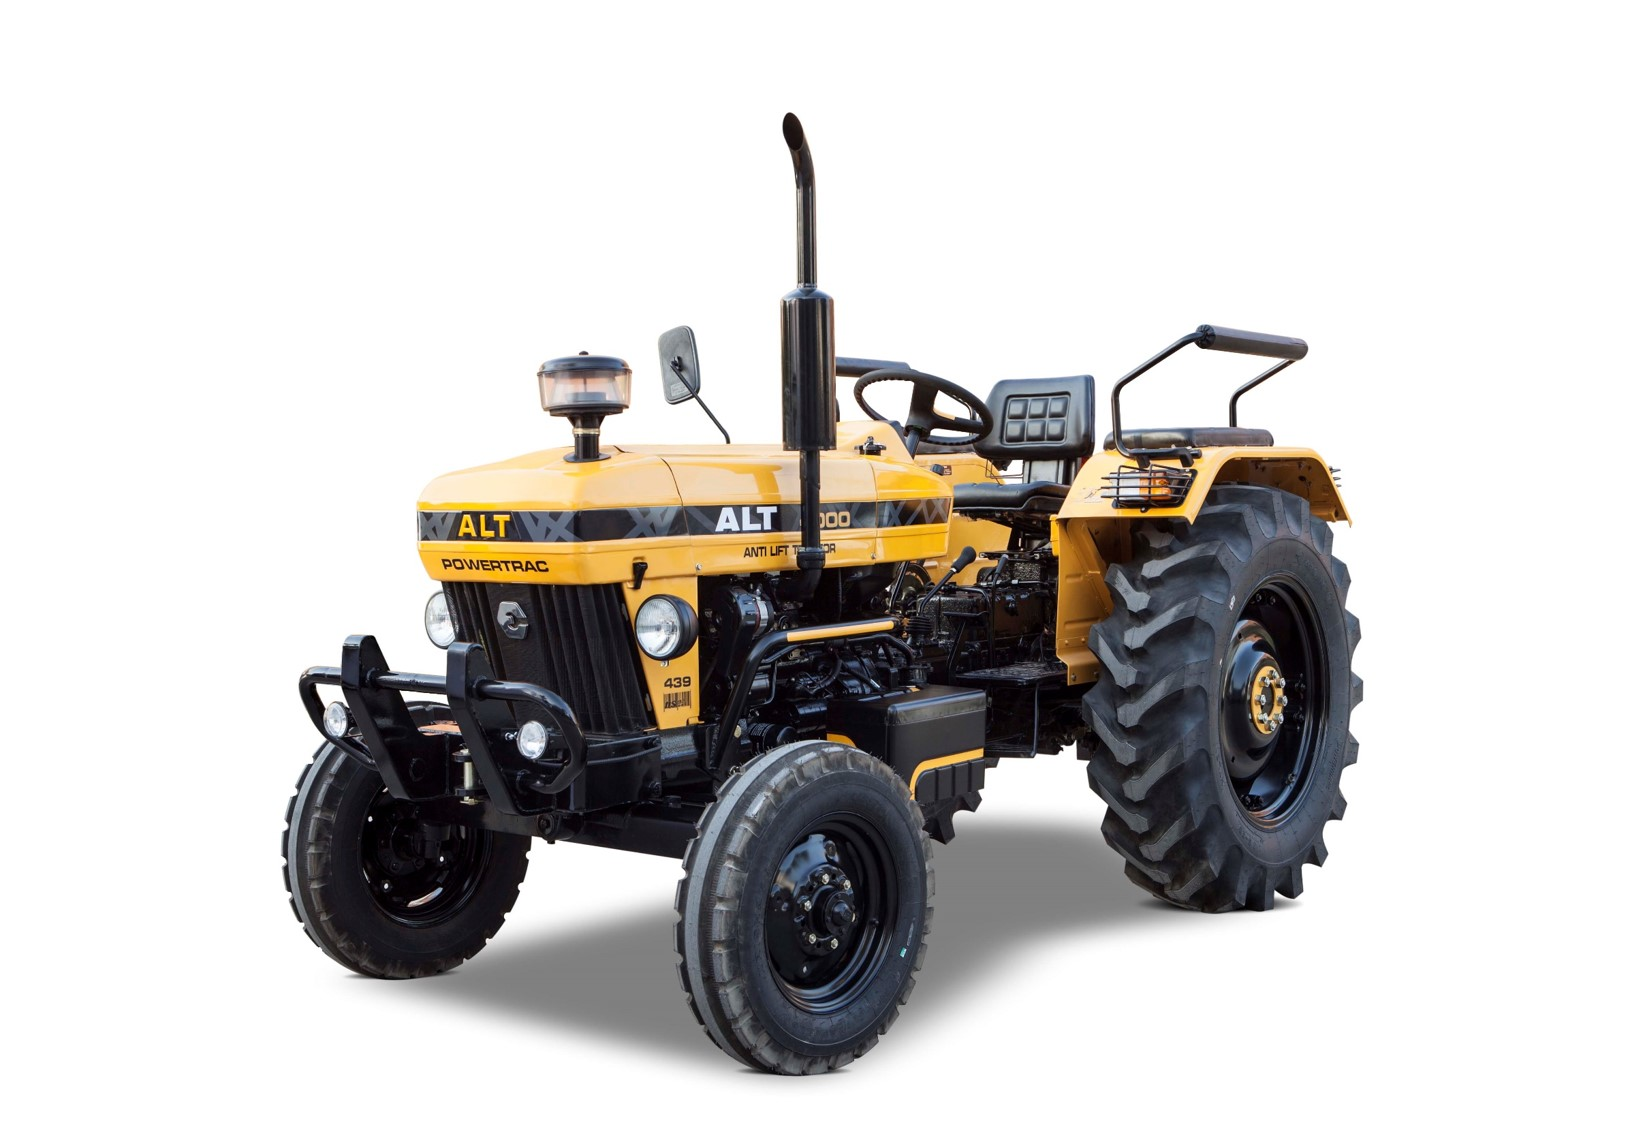 escort 355 tractor price